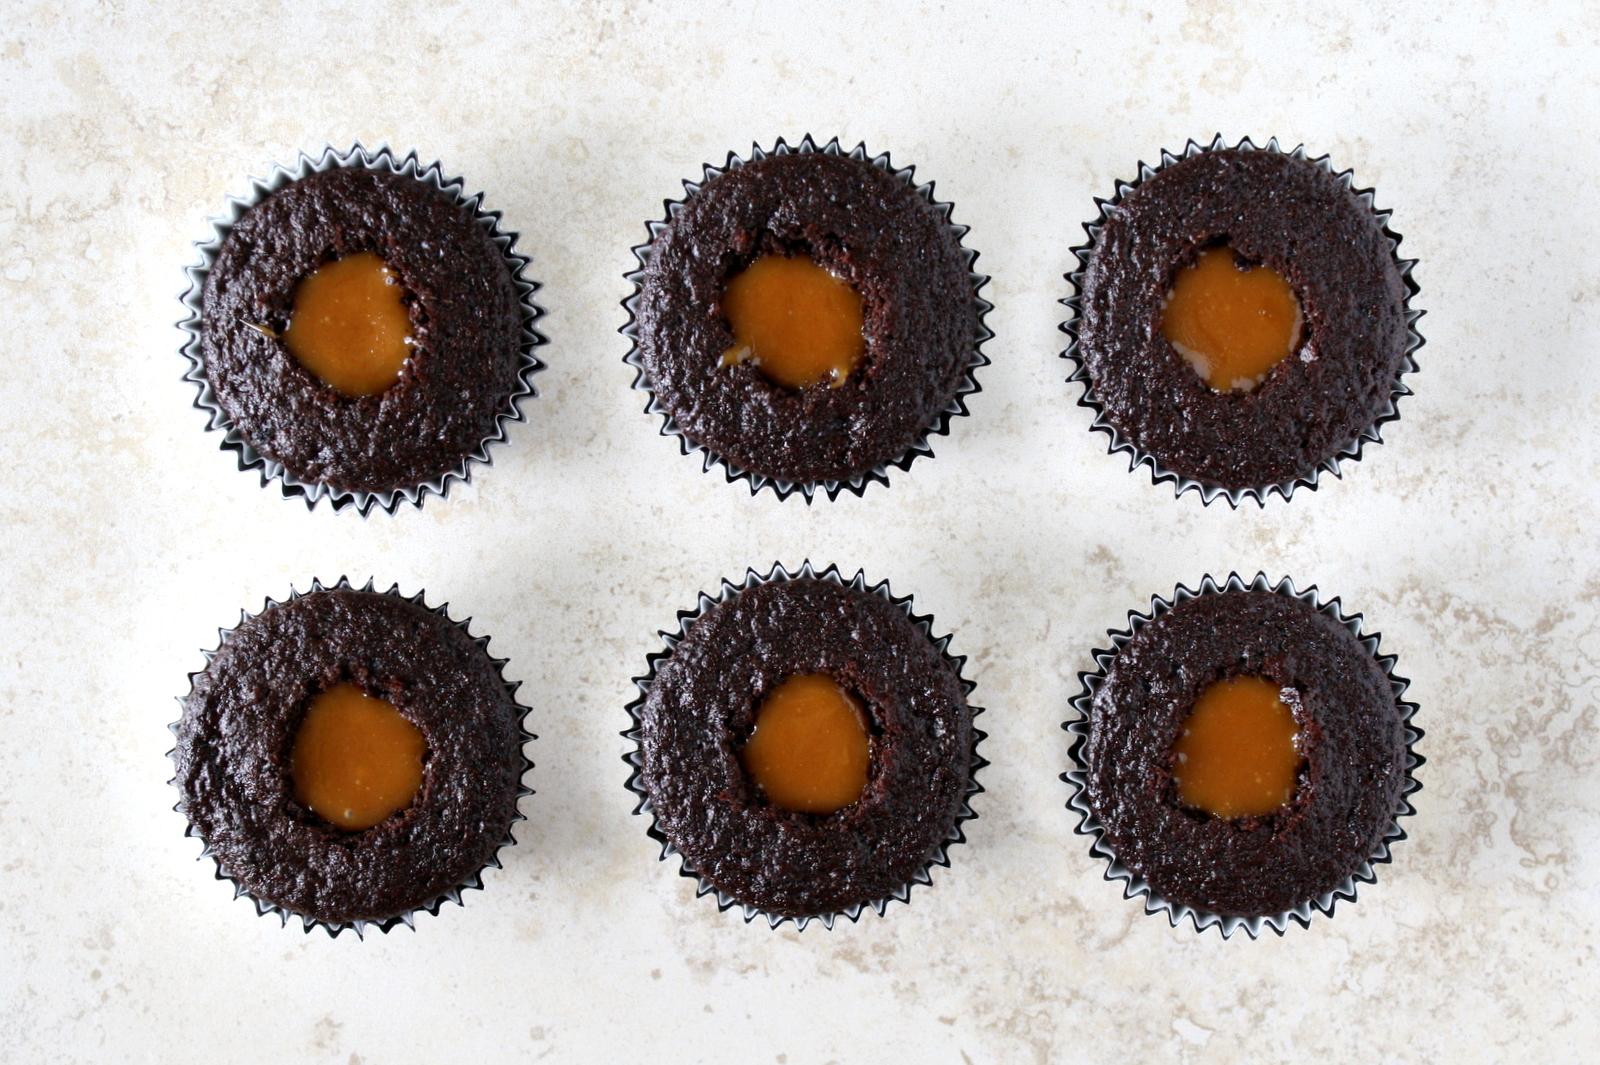 coffee toffee caramel cupcakes (aka Bonnaroo Buzz cupcakes)